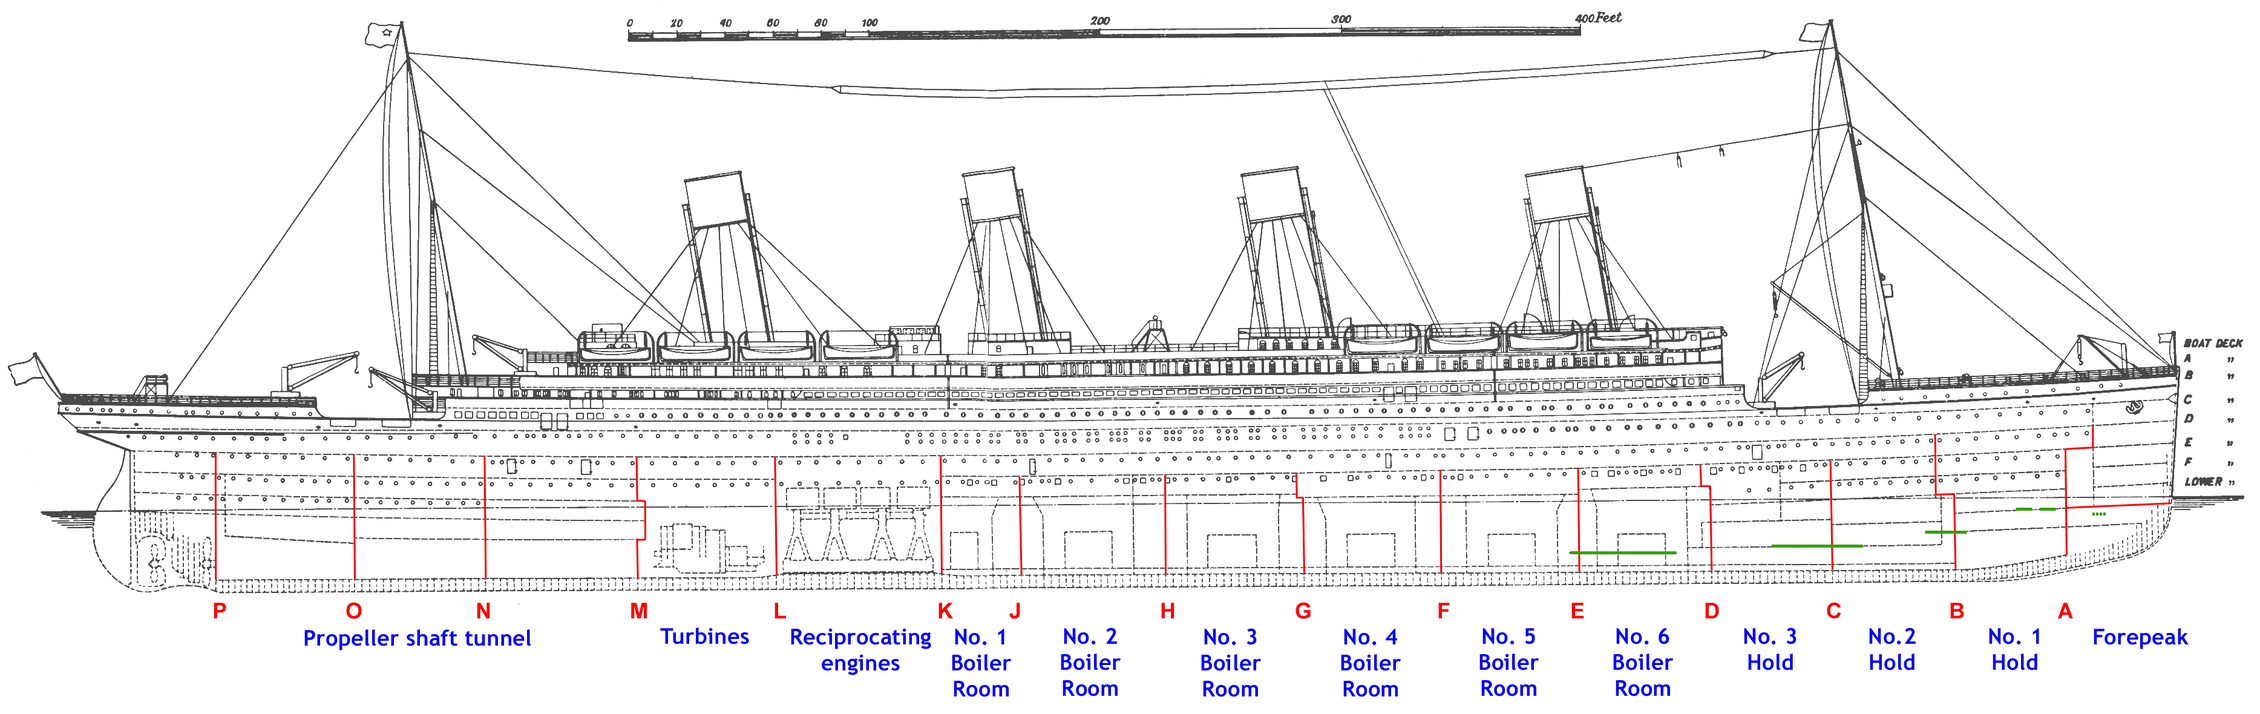 RMS Titanic Wikiwand